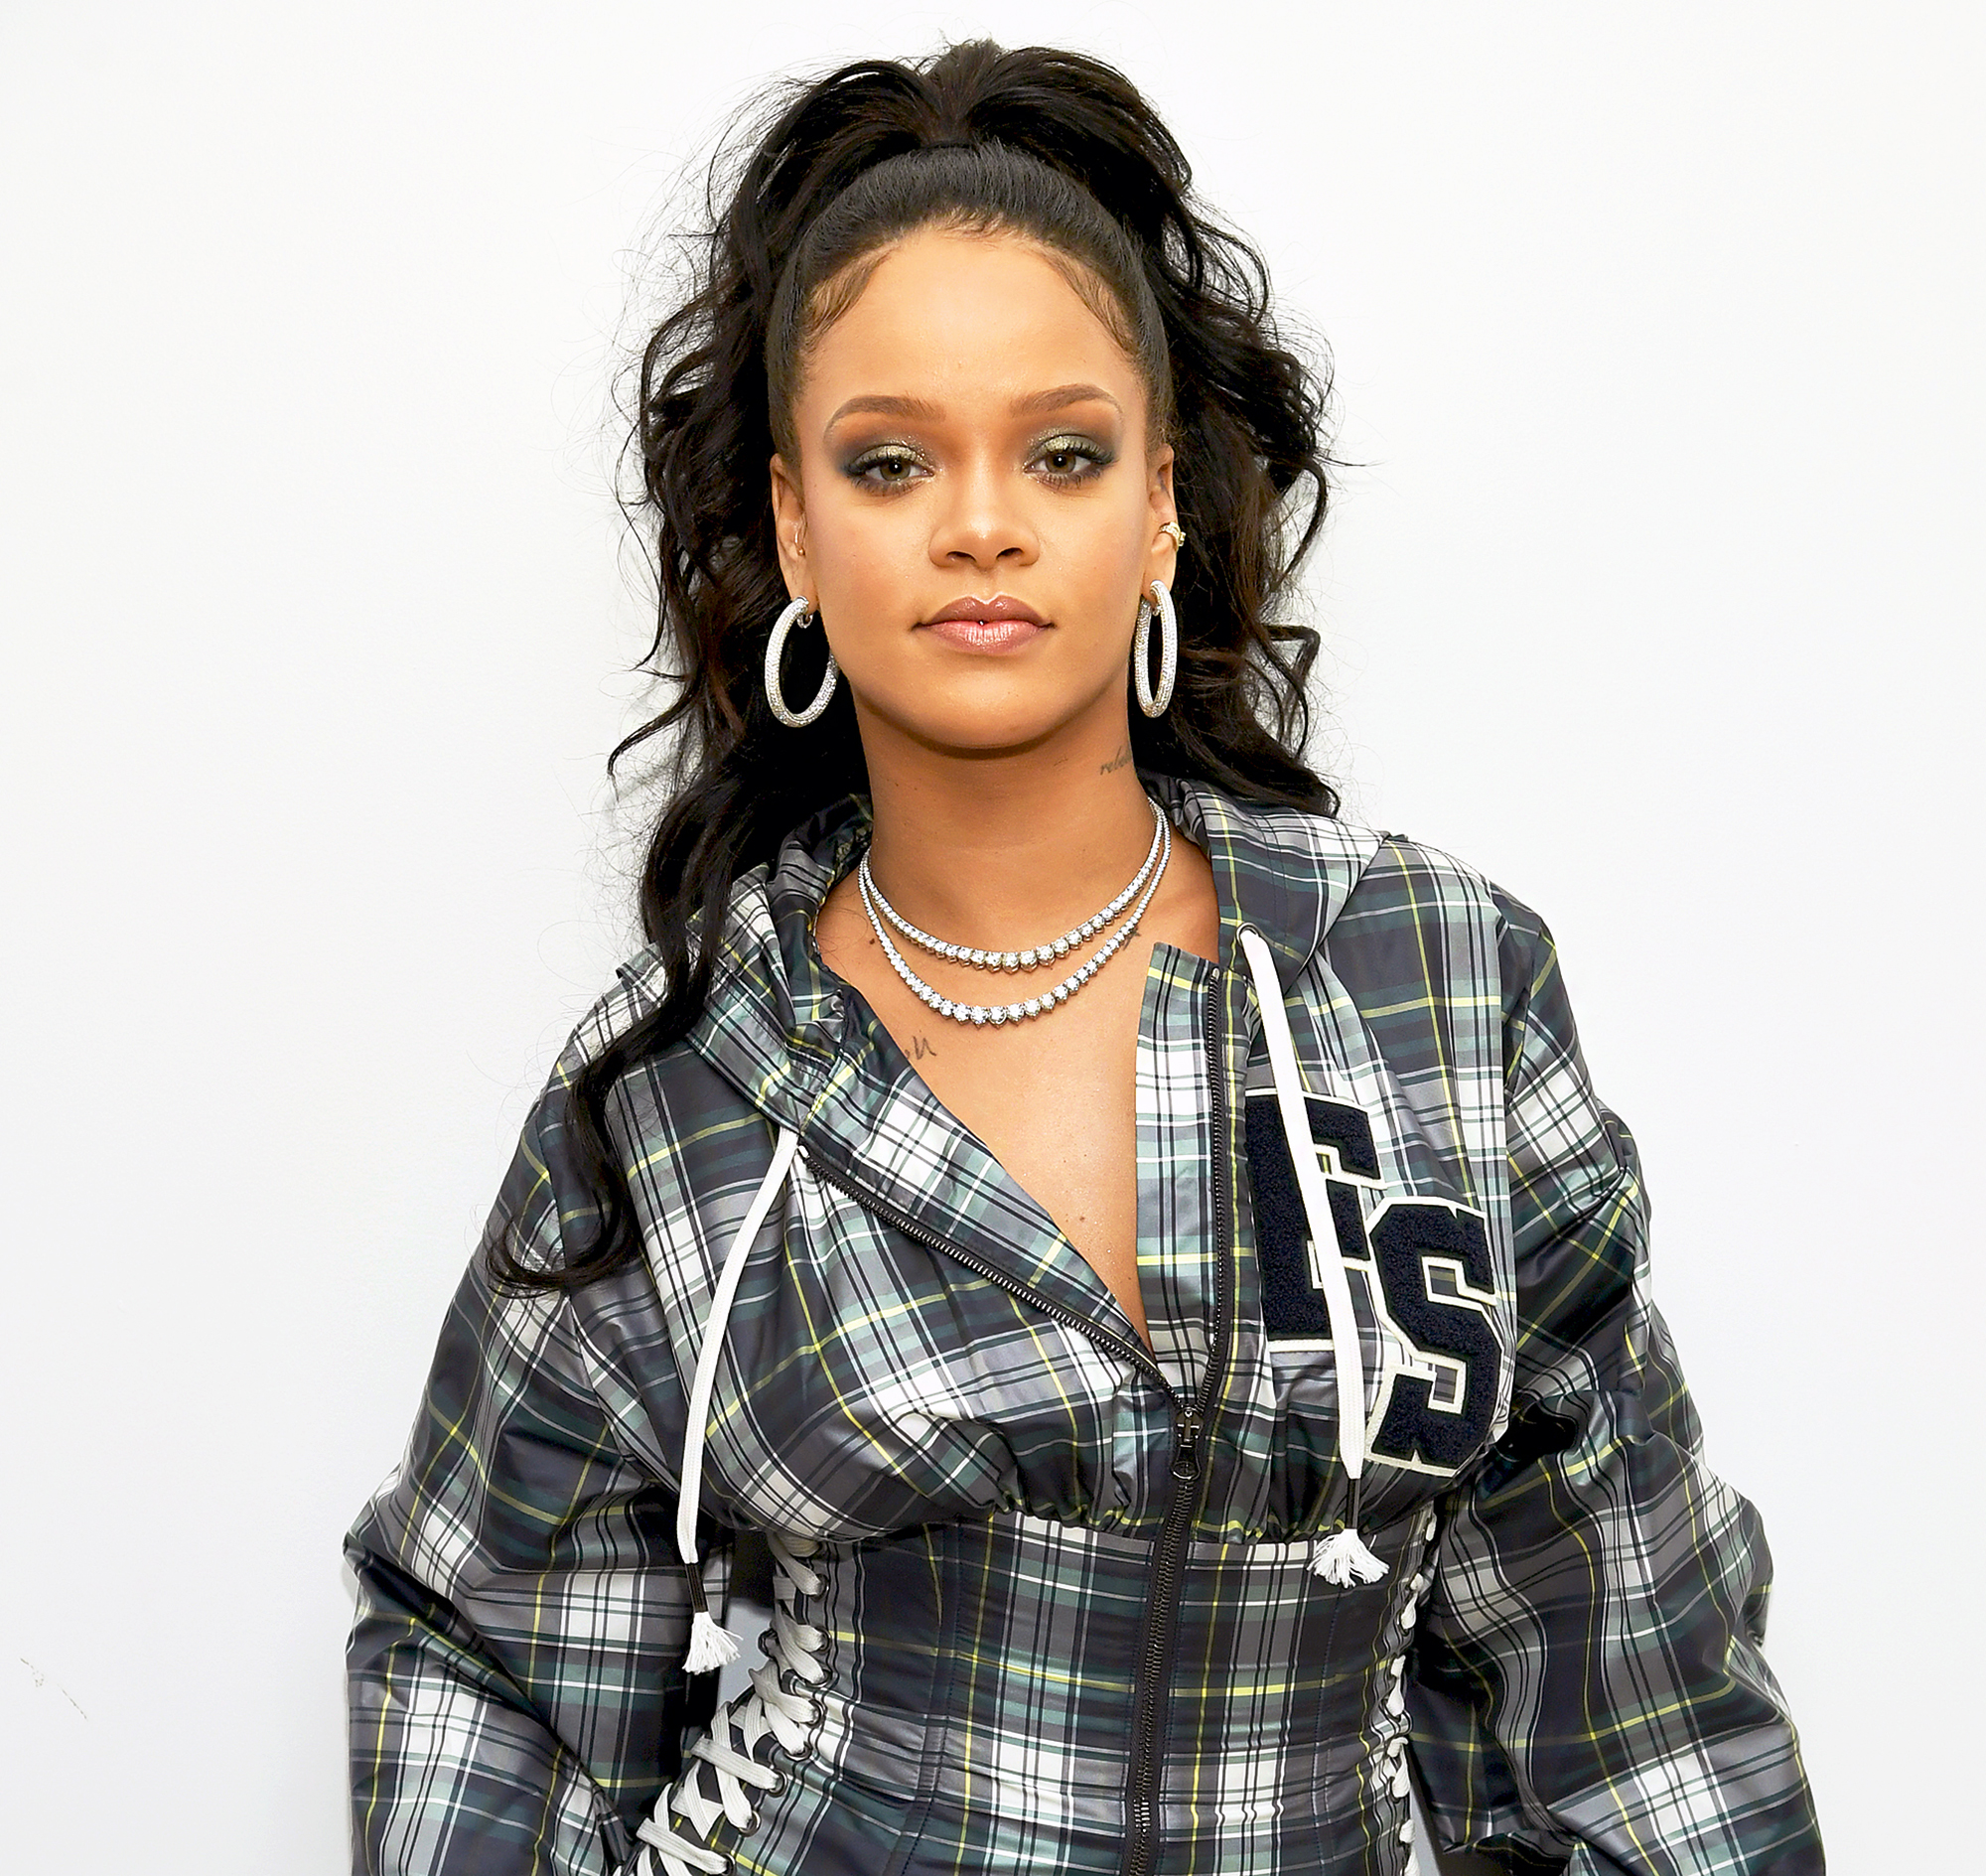 Rihanna slams Snapchat's offensive ad: 'Shame on you'